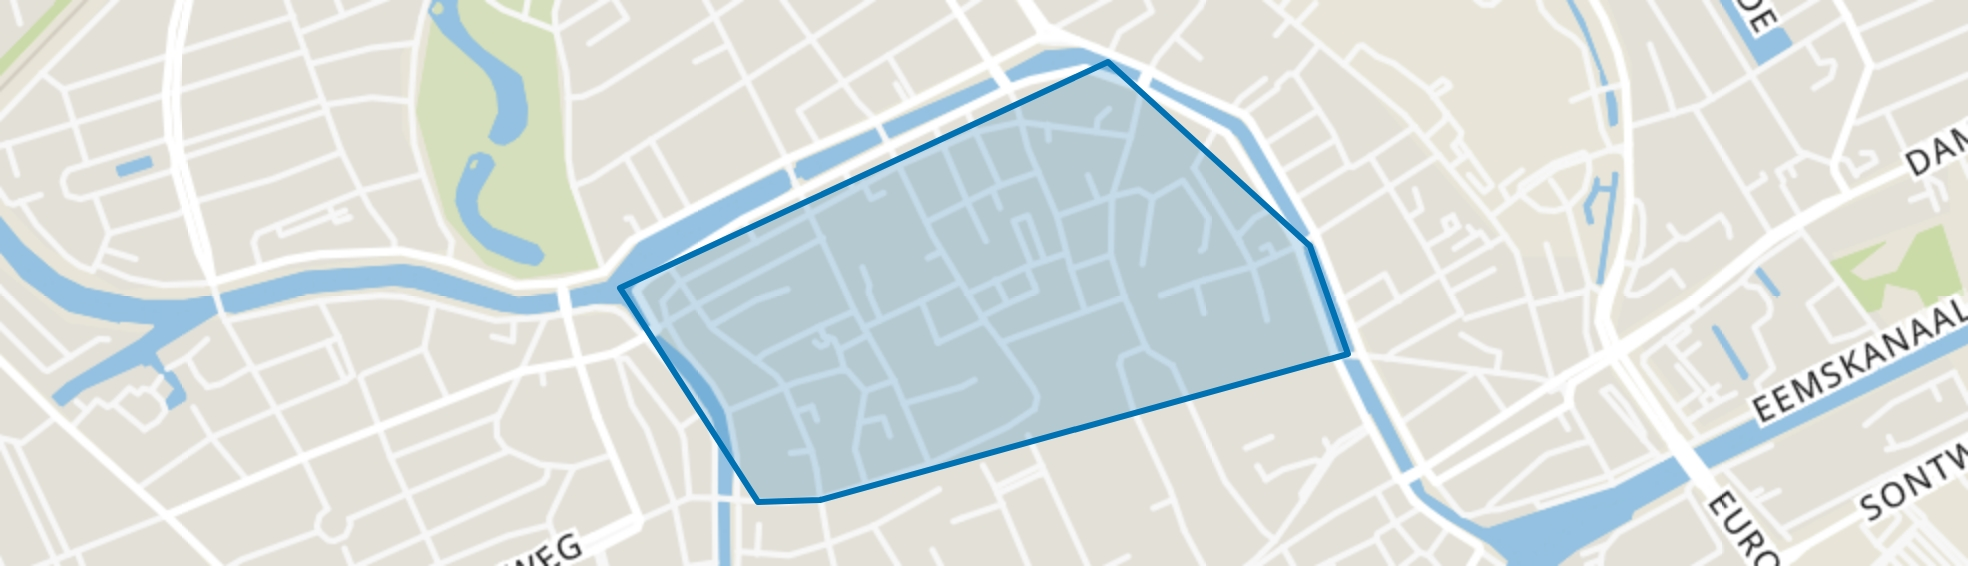 Binnenstad-Noord, Groningen map